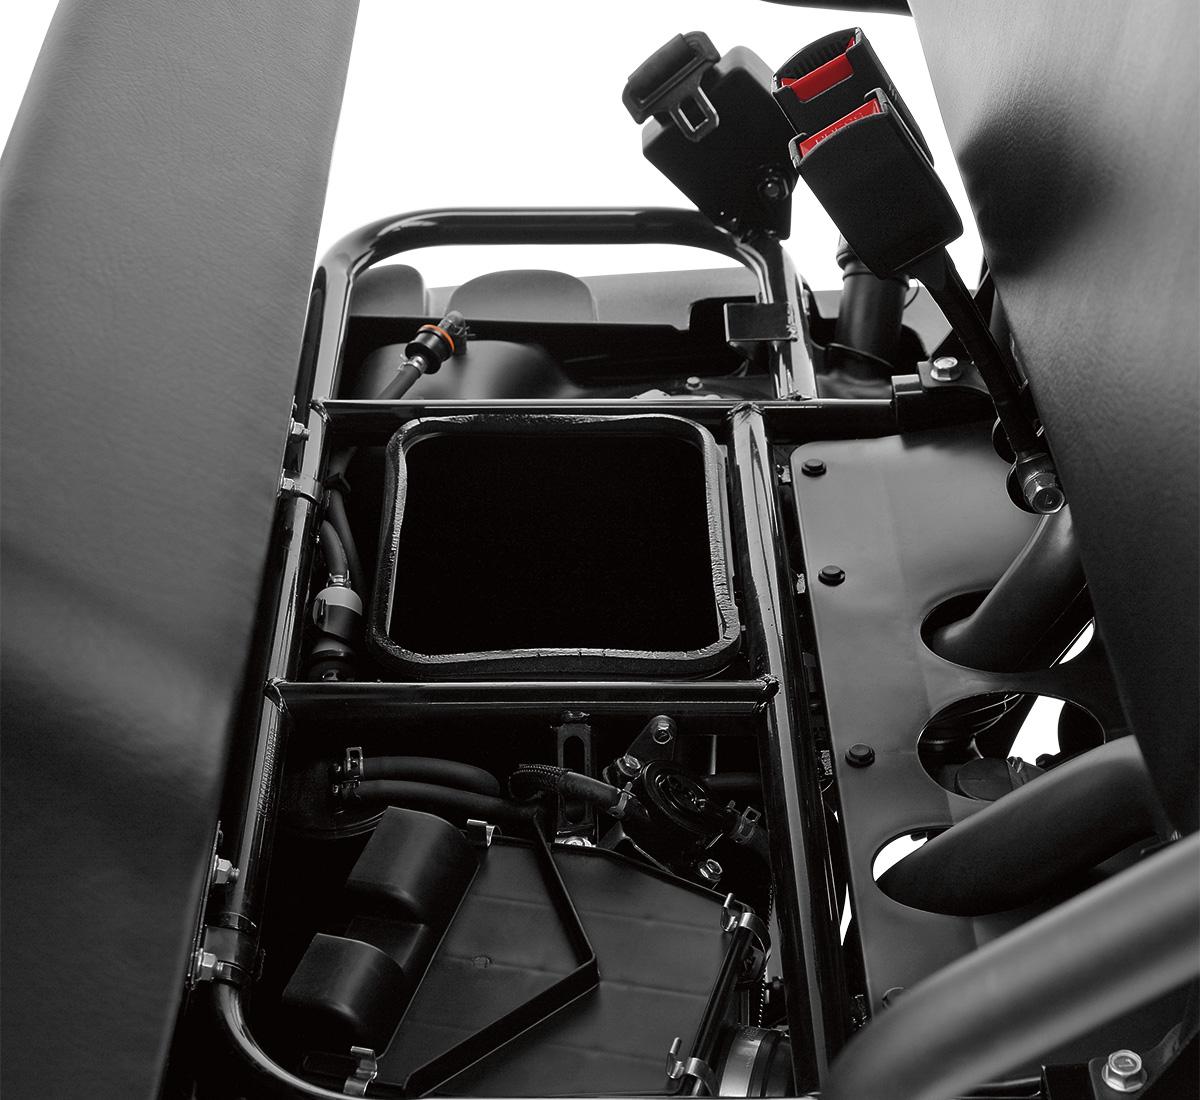 2016 mule™ 610 4x4 xc se accessories